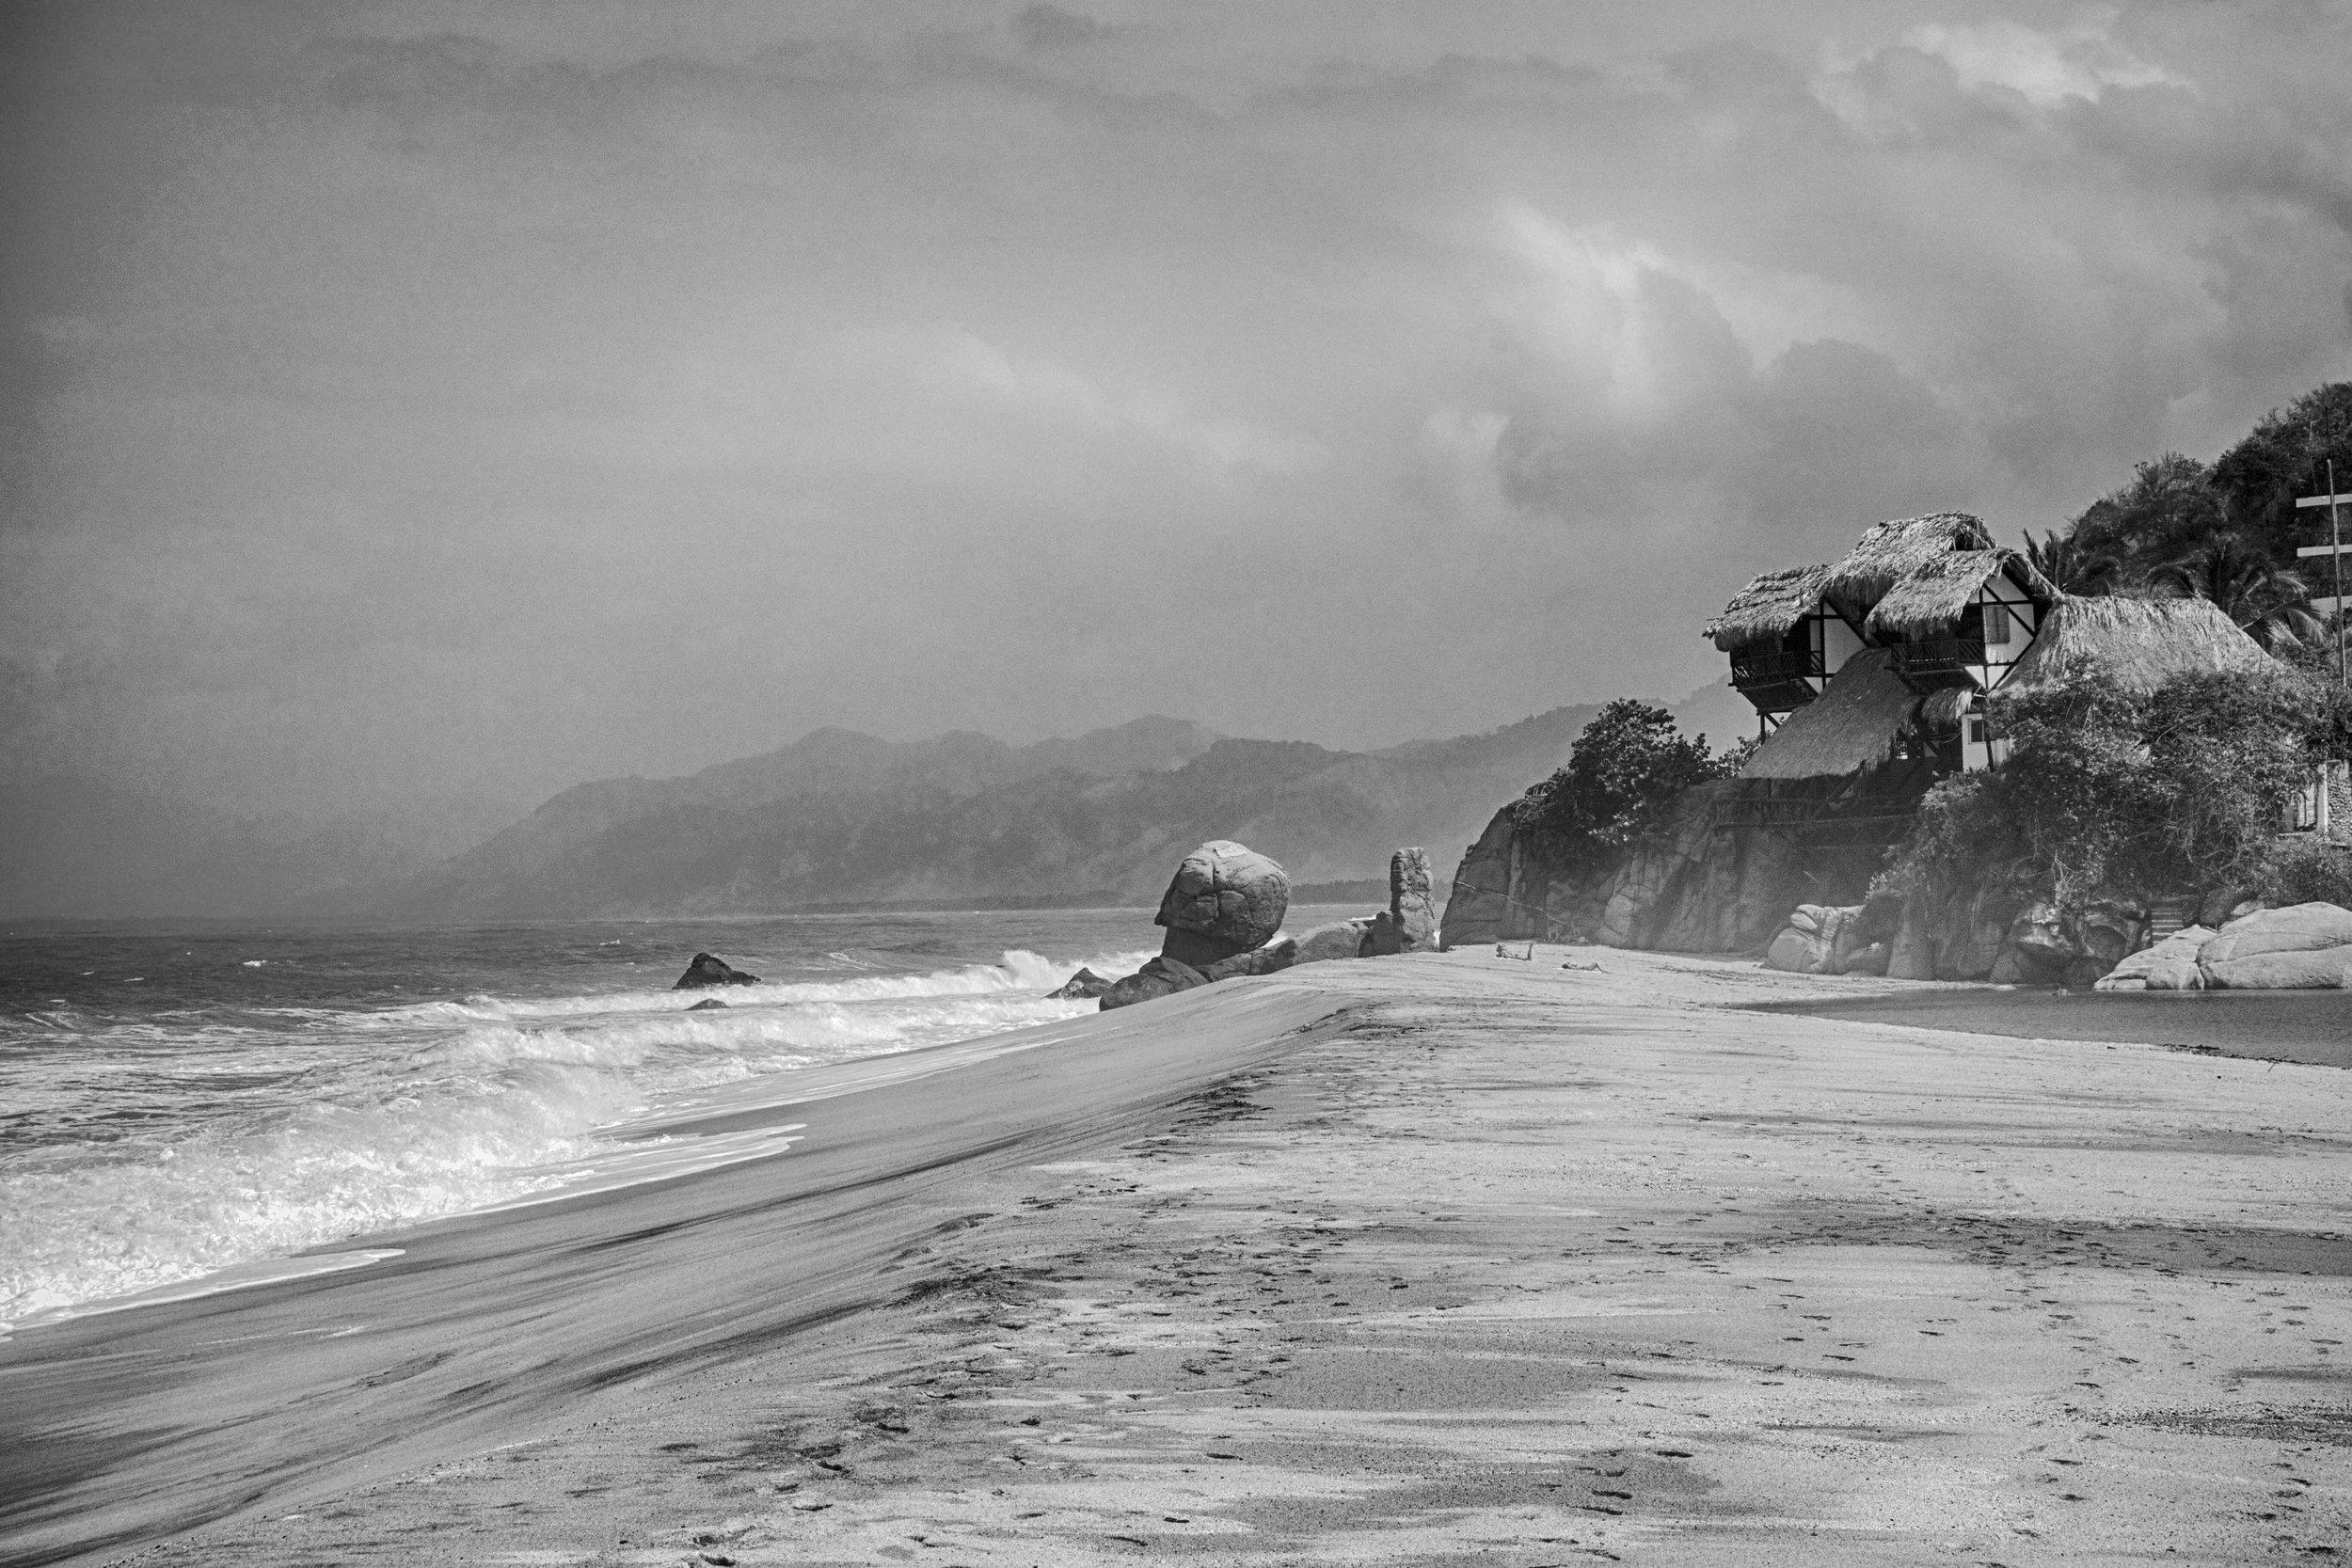 Los Naranjos beach, located on the edge of Tayrona National Park